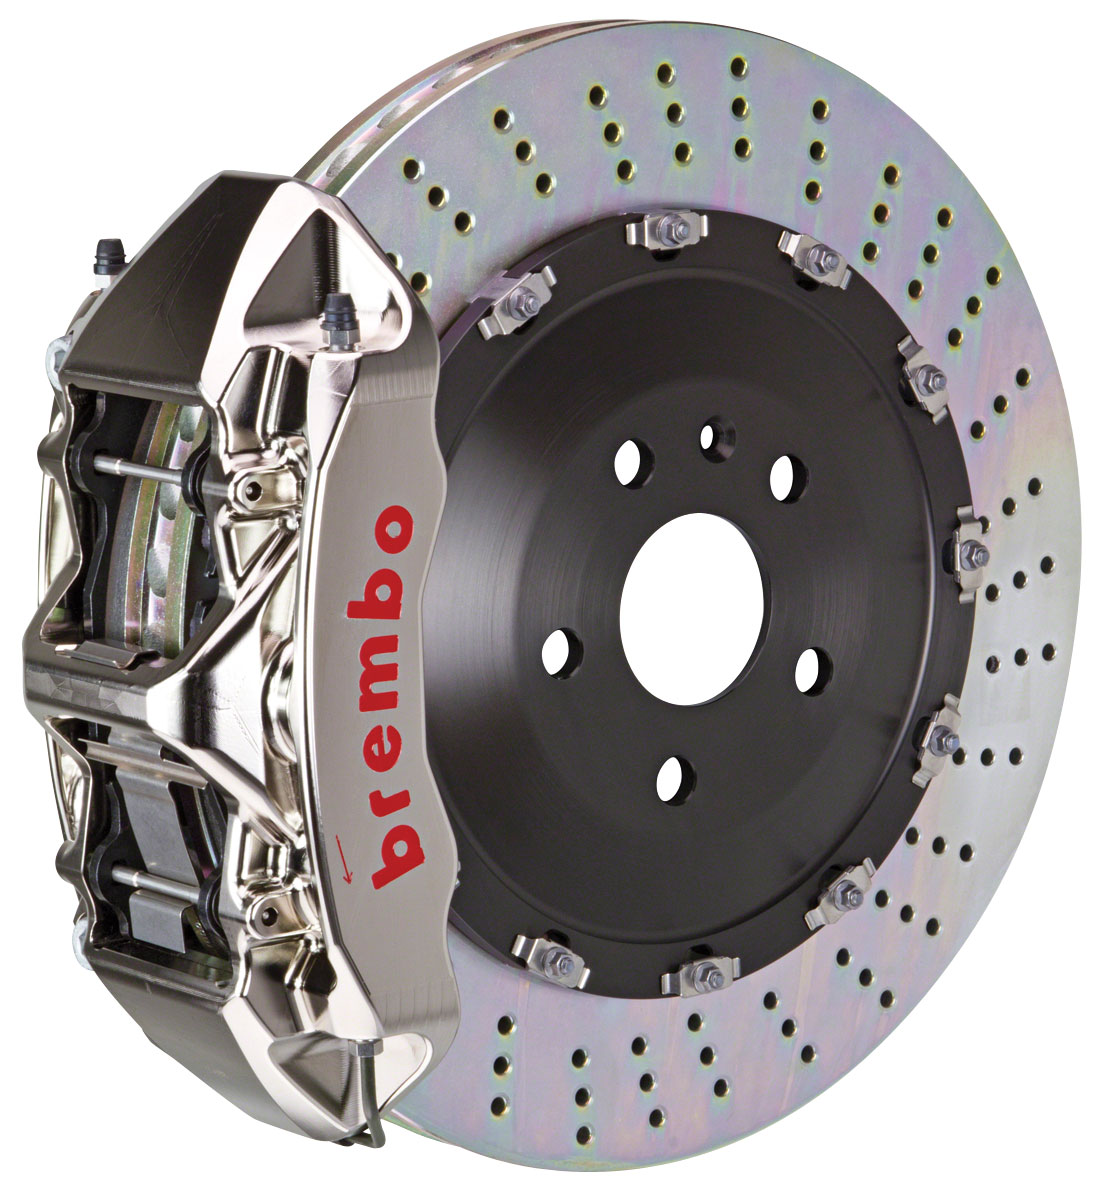 Brake Set, Brembo GT-R, 2009-15 CTS-V, Front, 2pc 405mm Rotors, 1pc 6P Caliper